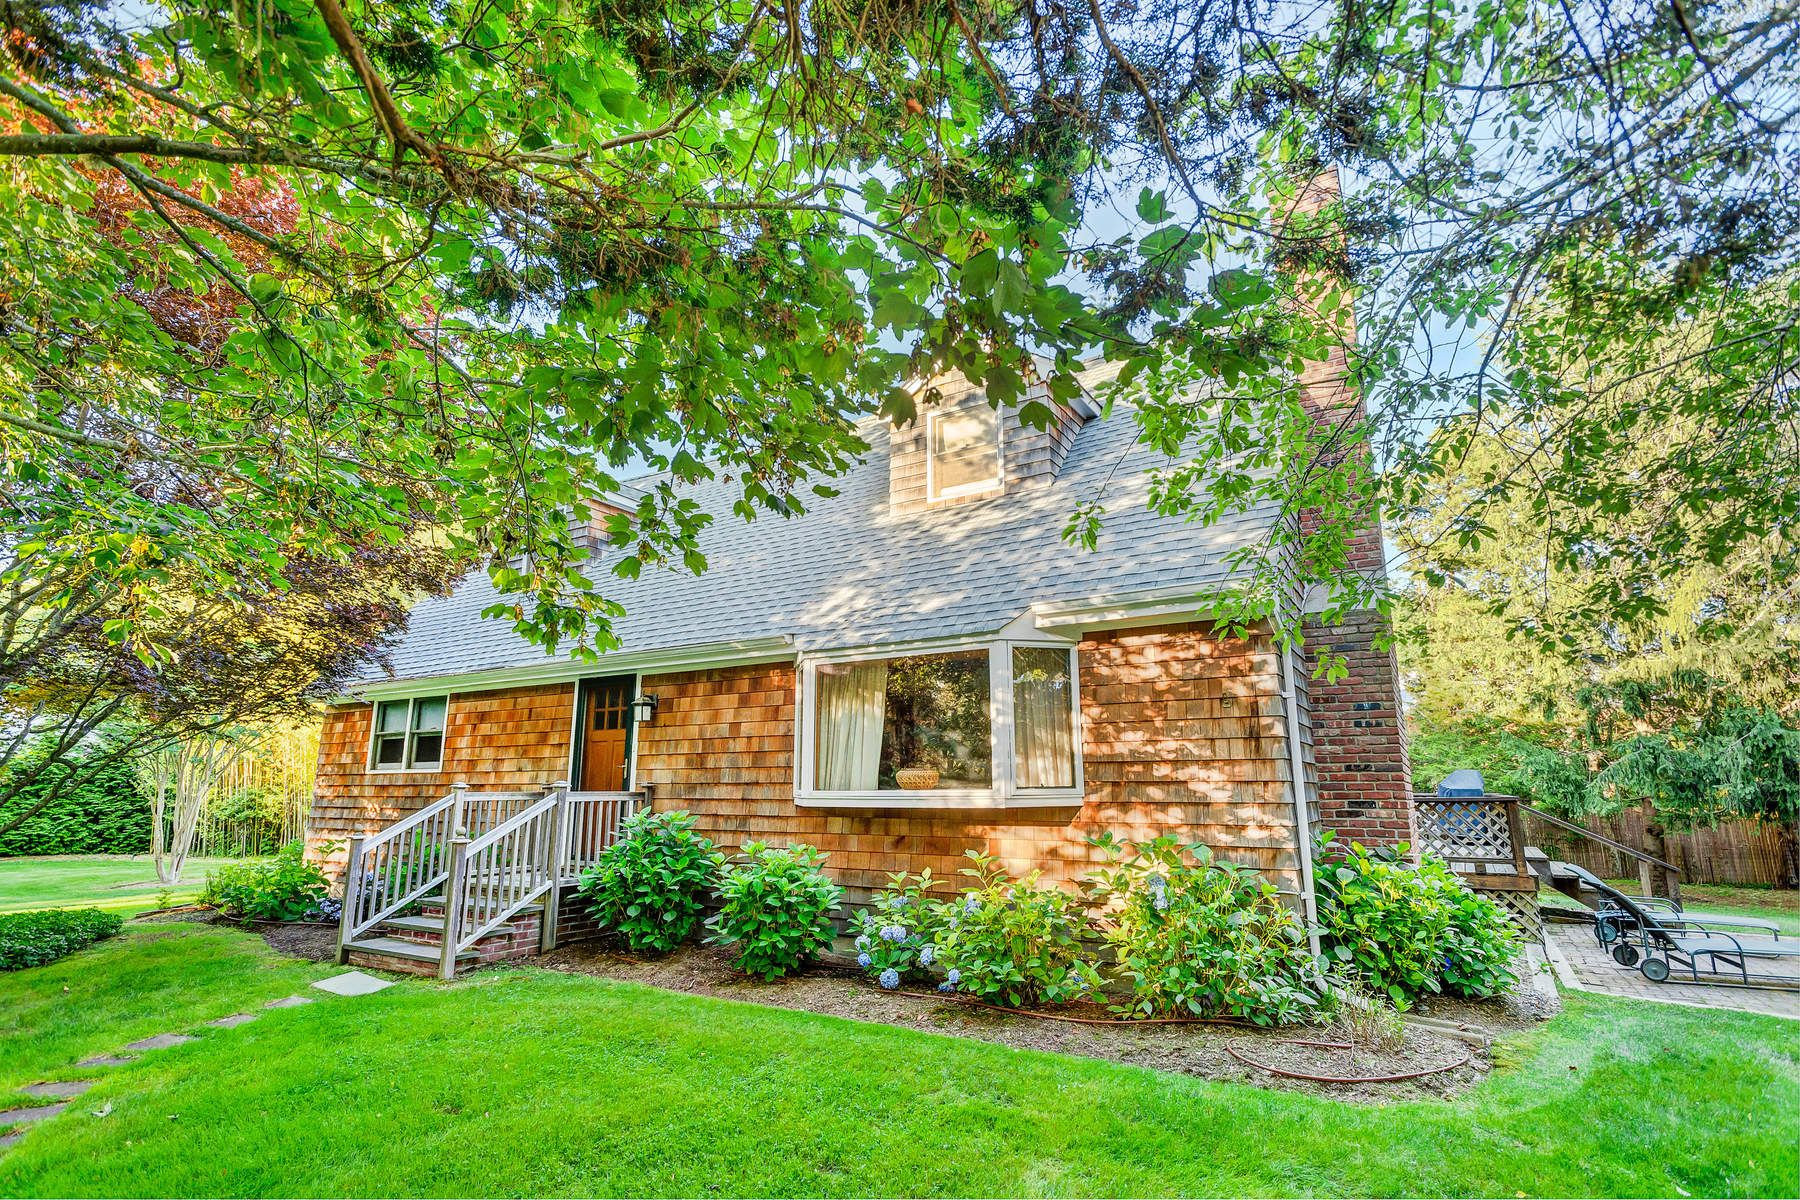 Single Family Home for Sale at Moments To Amagansett Village 84 Schellinger Road, Amagansett, New York, 11930 United States